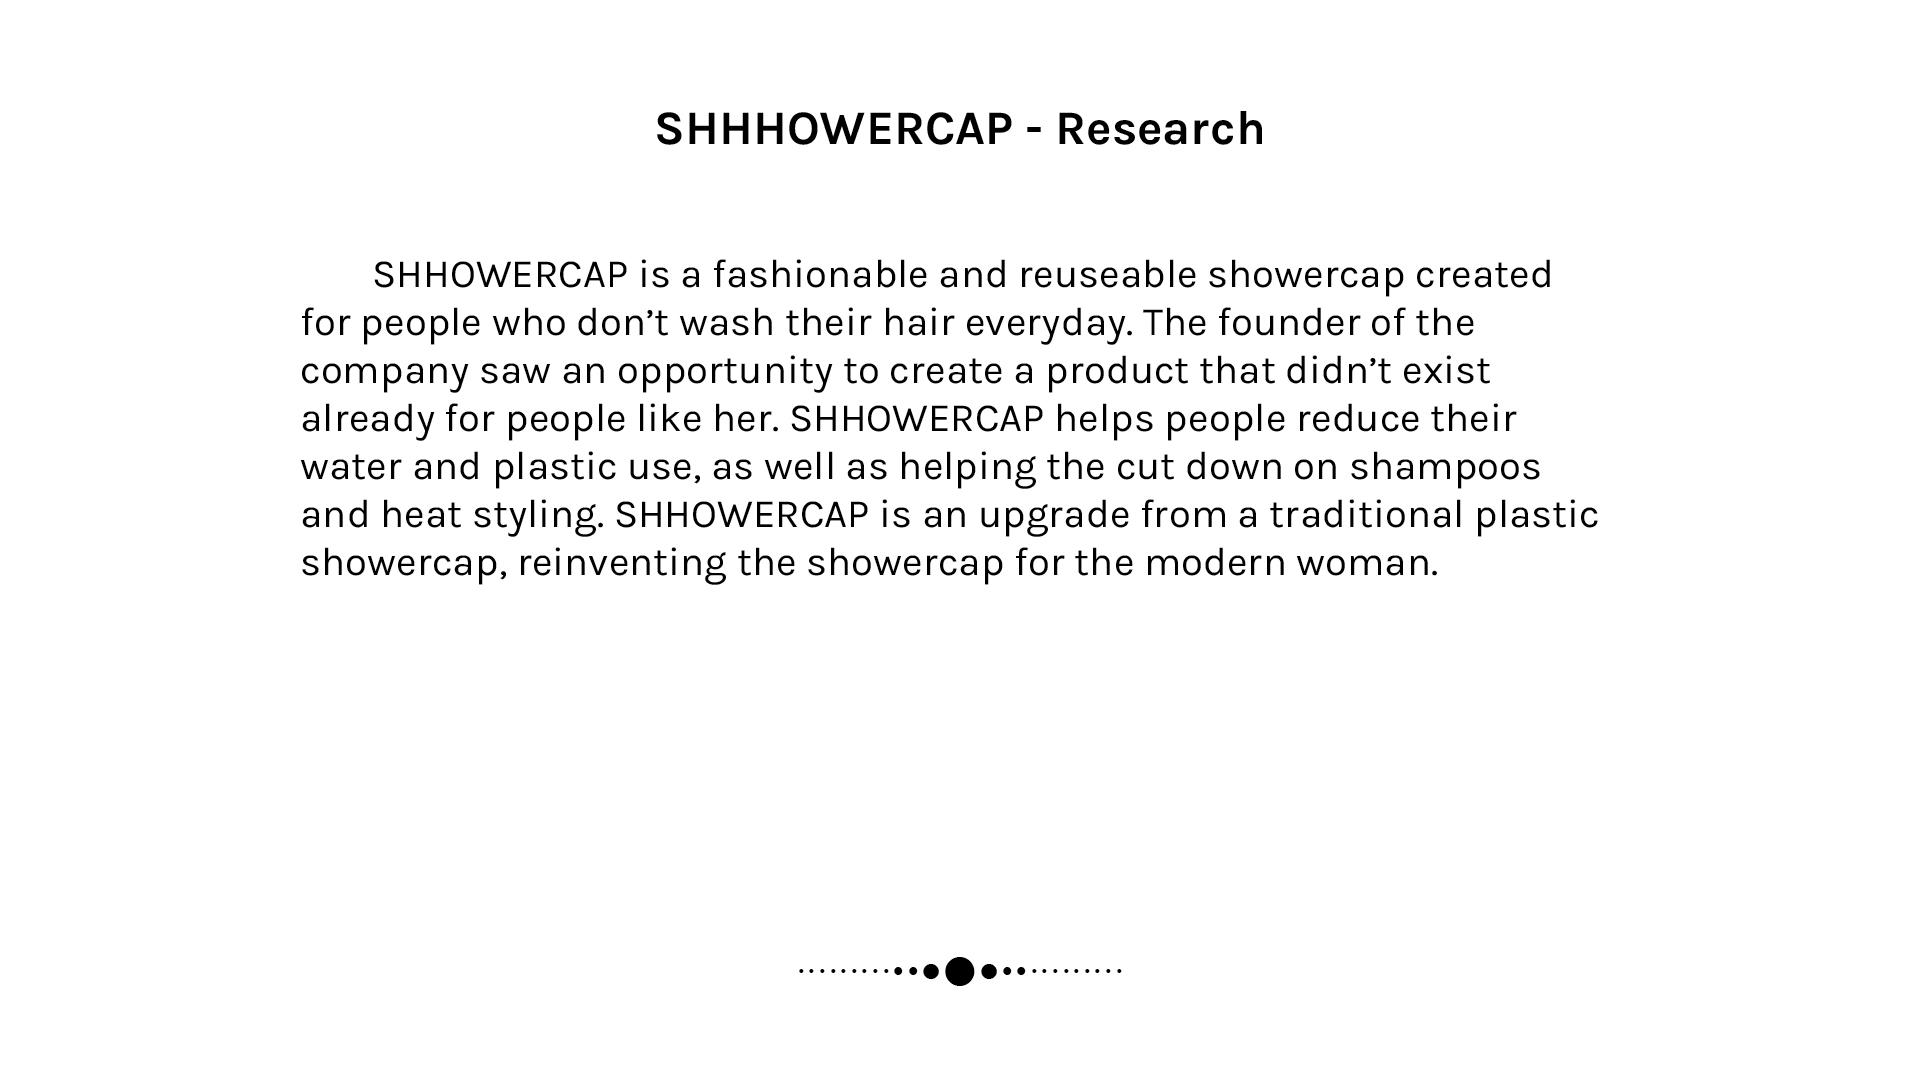 SHHHOWERCAP2.jpg